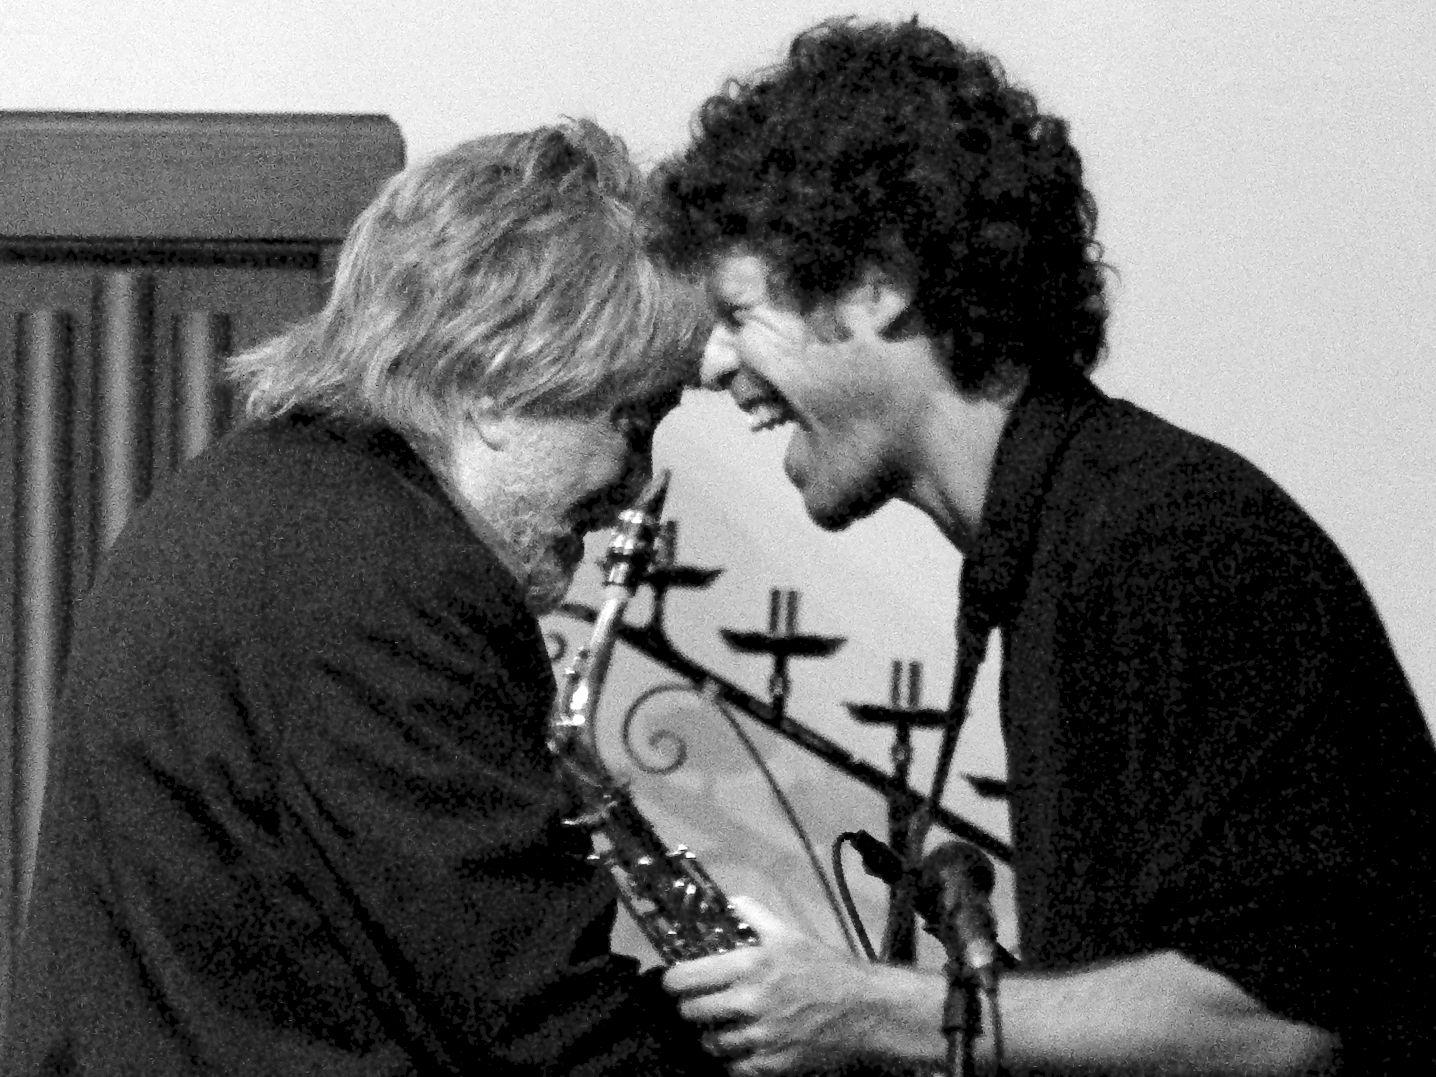 Mark Murphy and Anton Schwartz